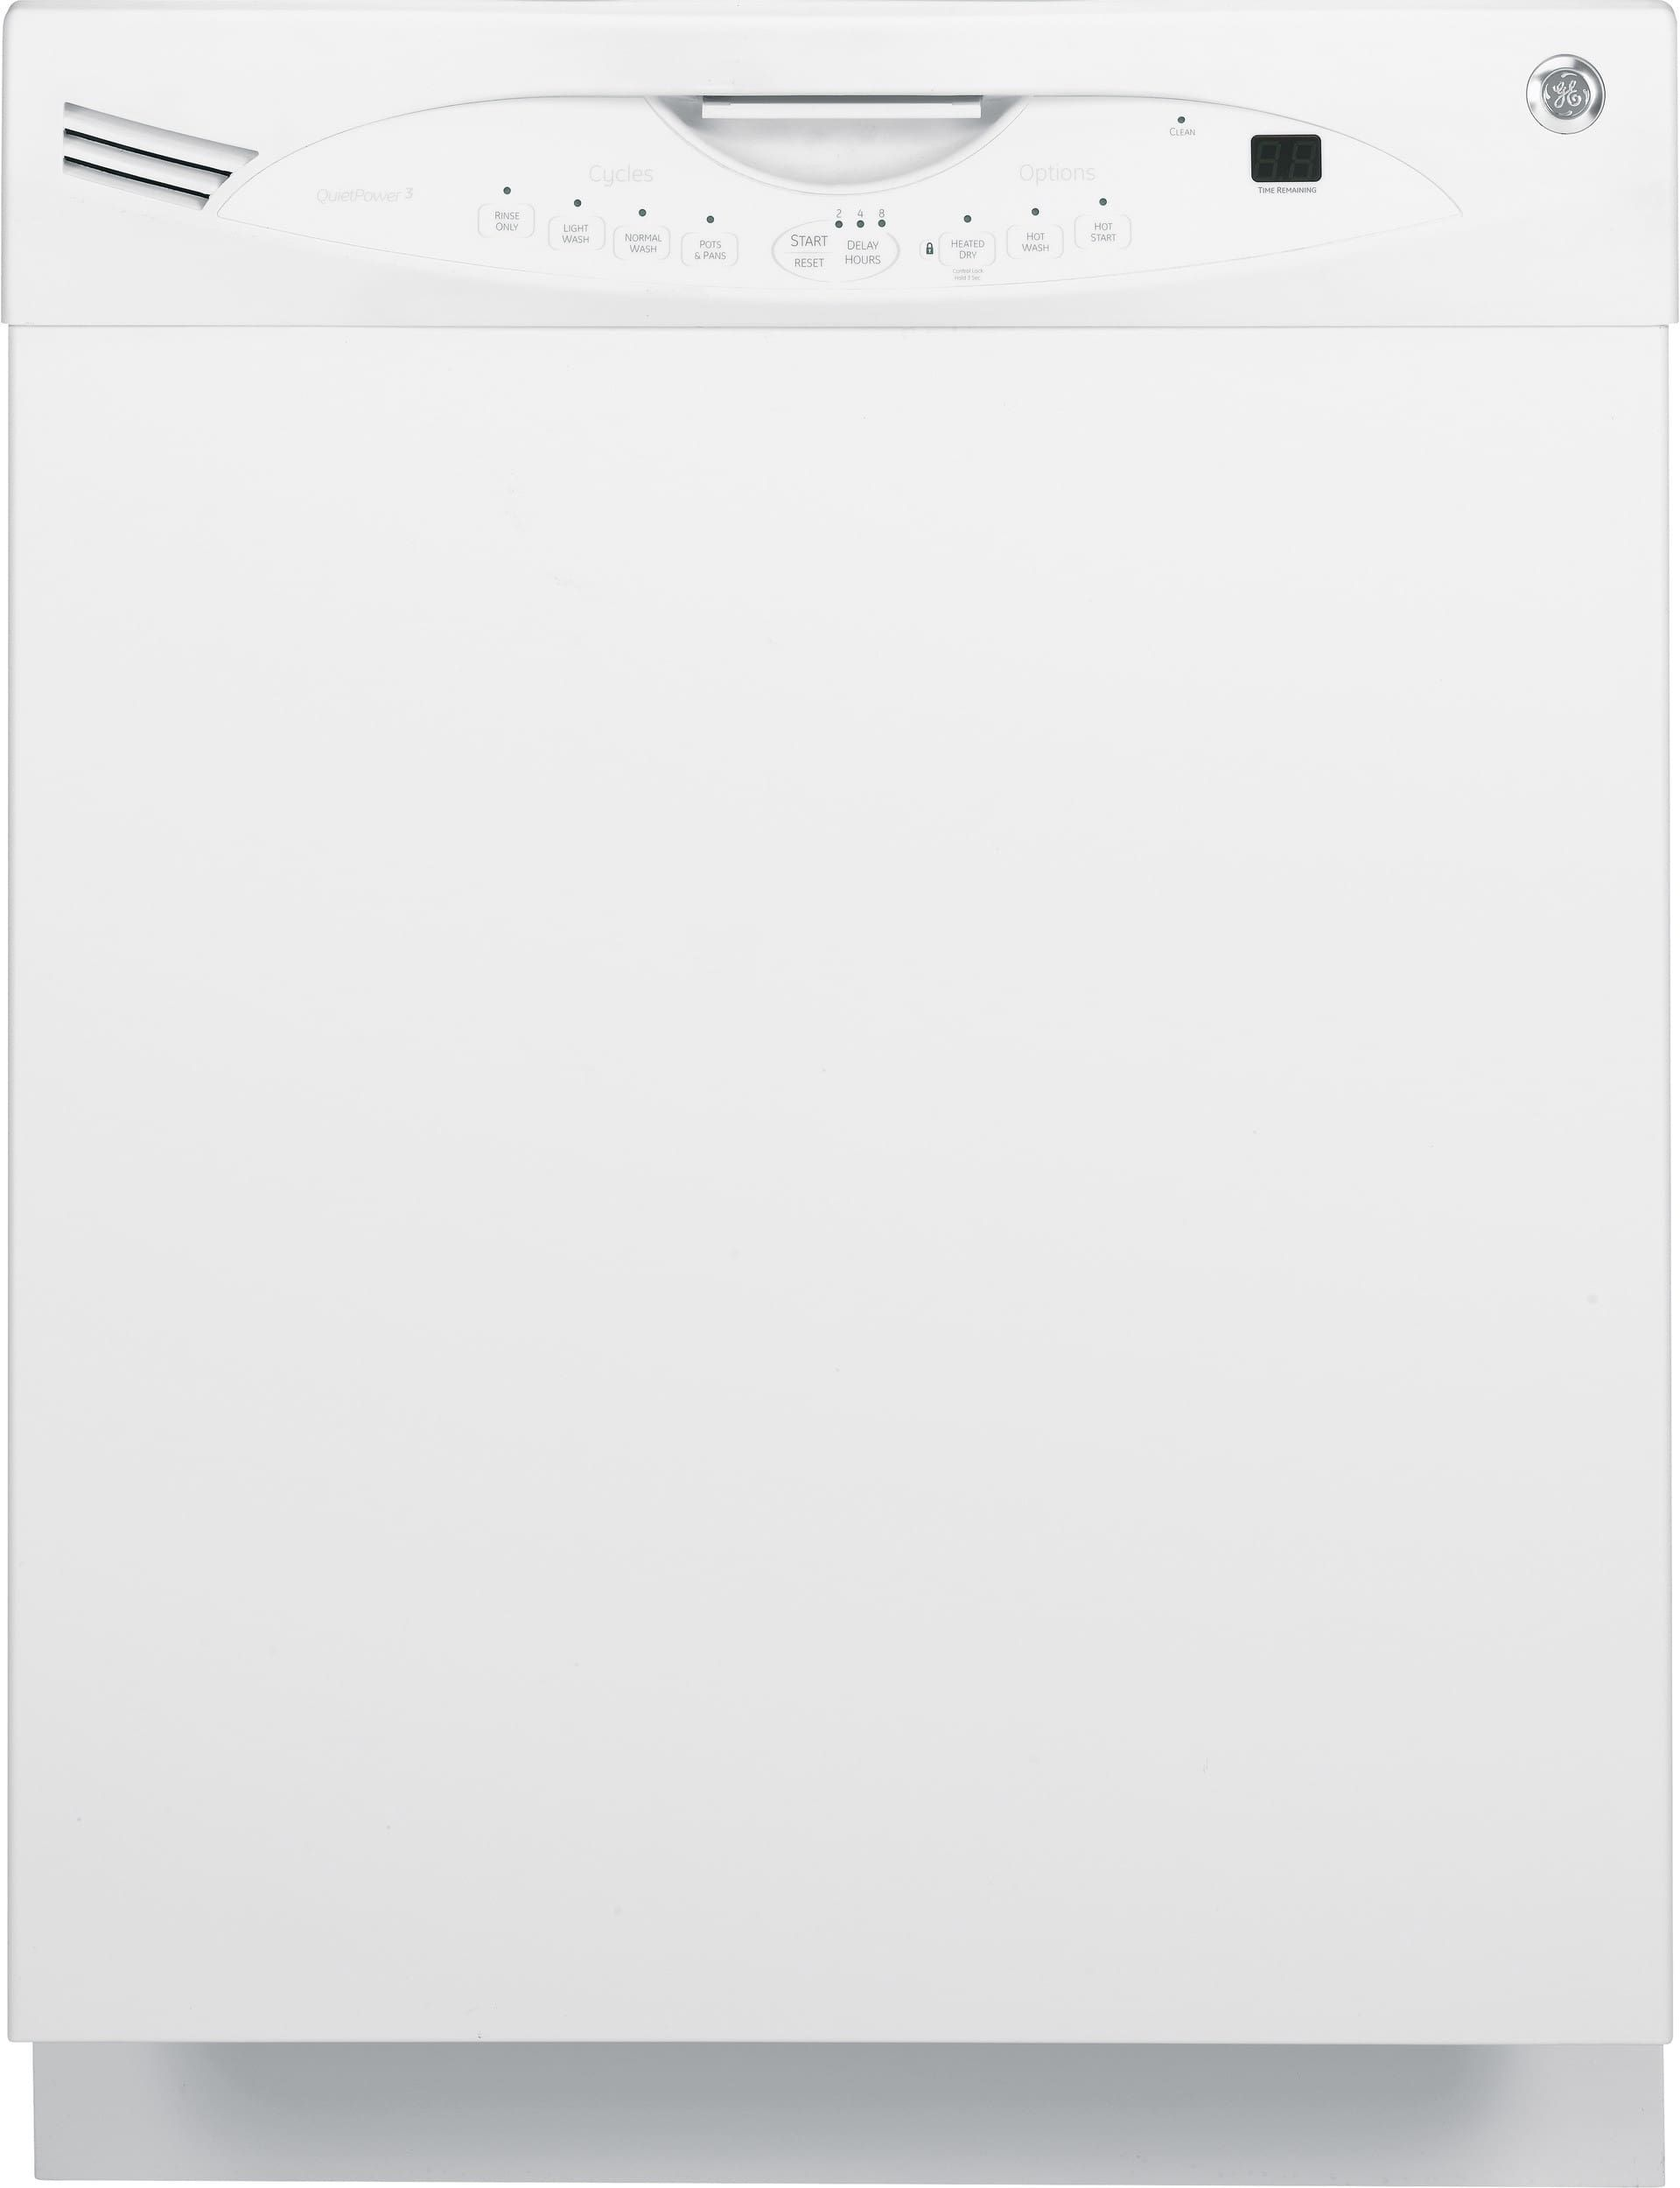 Ge Glda690fww Full Console Dishwasher With Stainless Steel Interior Quietpower Motor Delay Start 5 Level Wash System Dishwasher White Touchpads Dishwasher